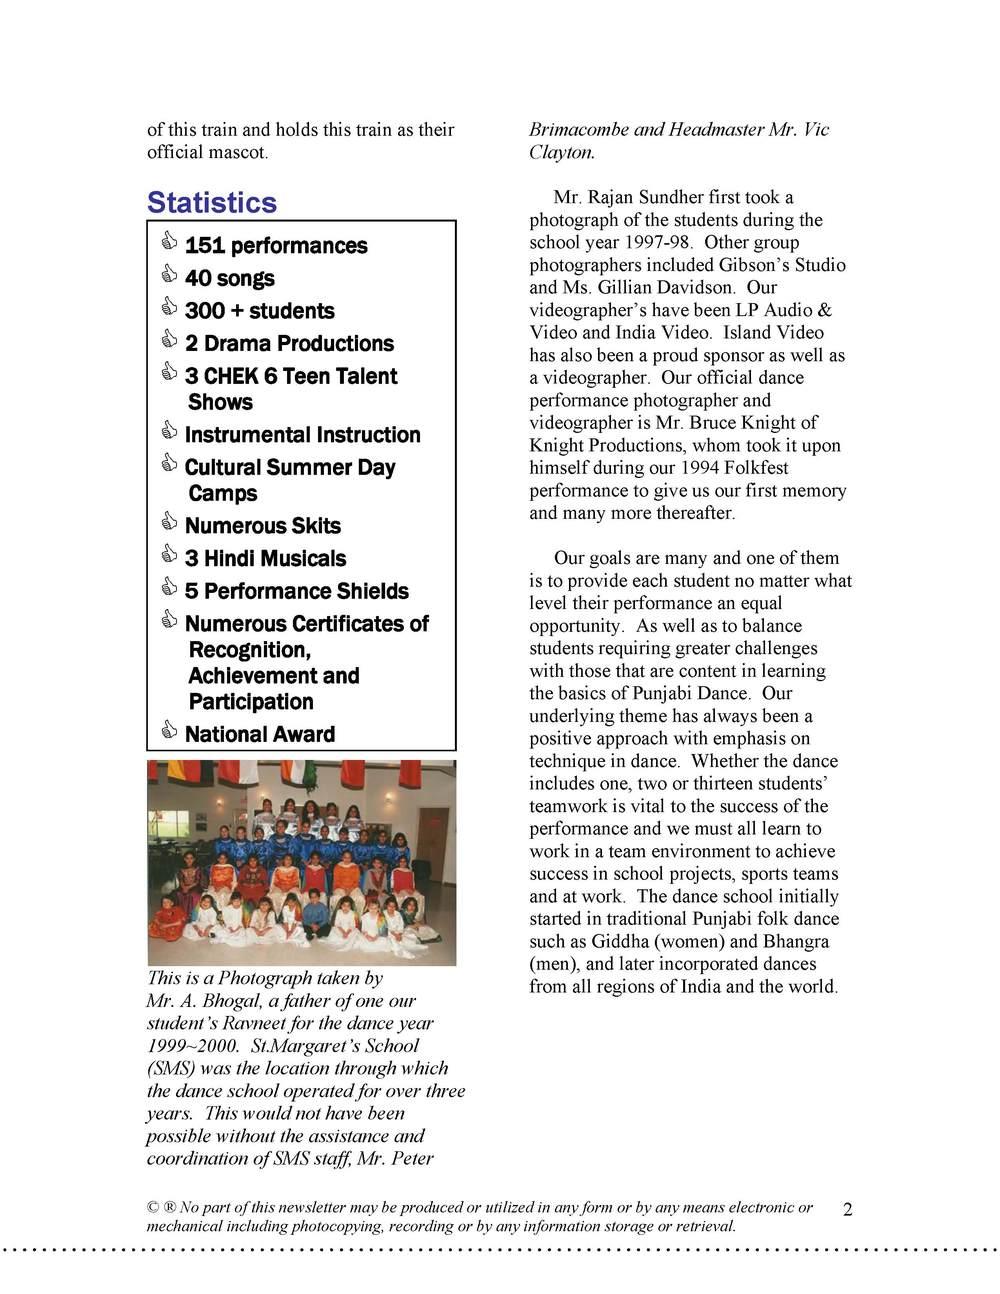 Newsletter 2005_Page_2.jpg